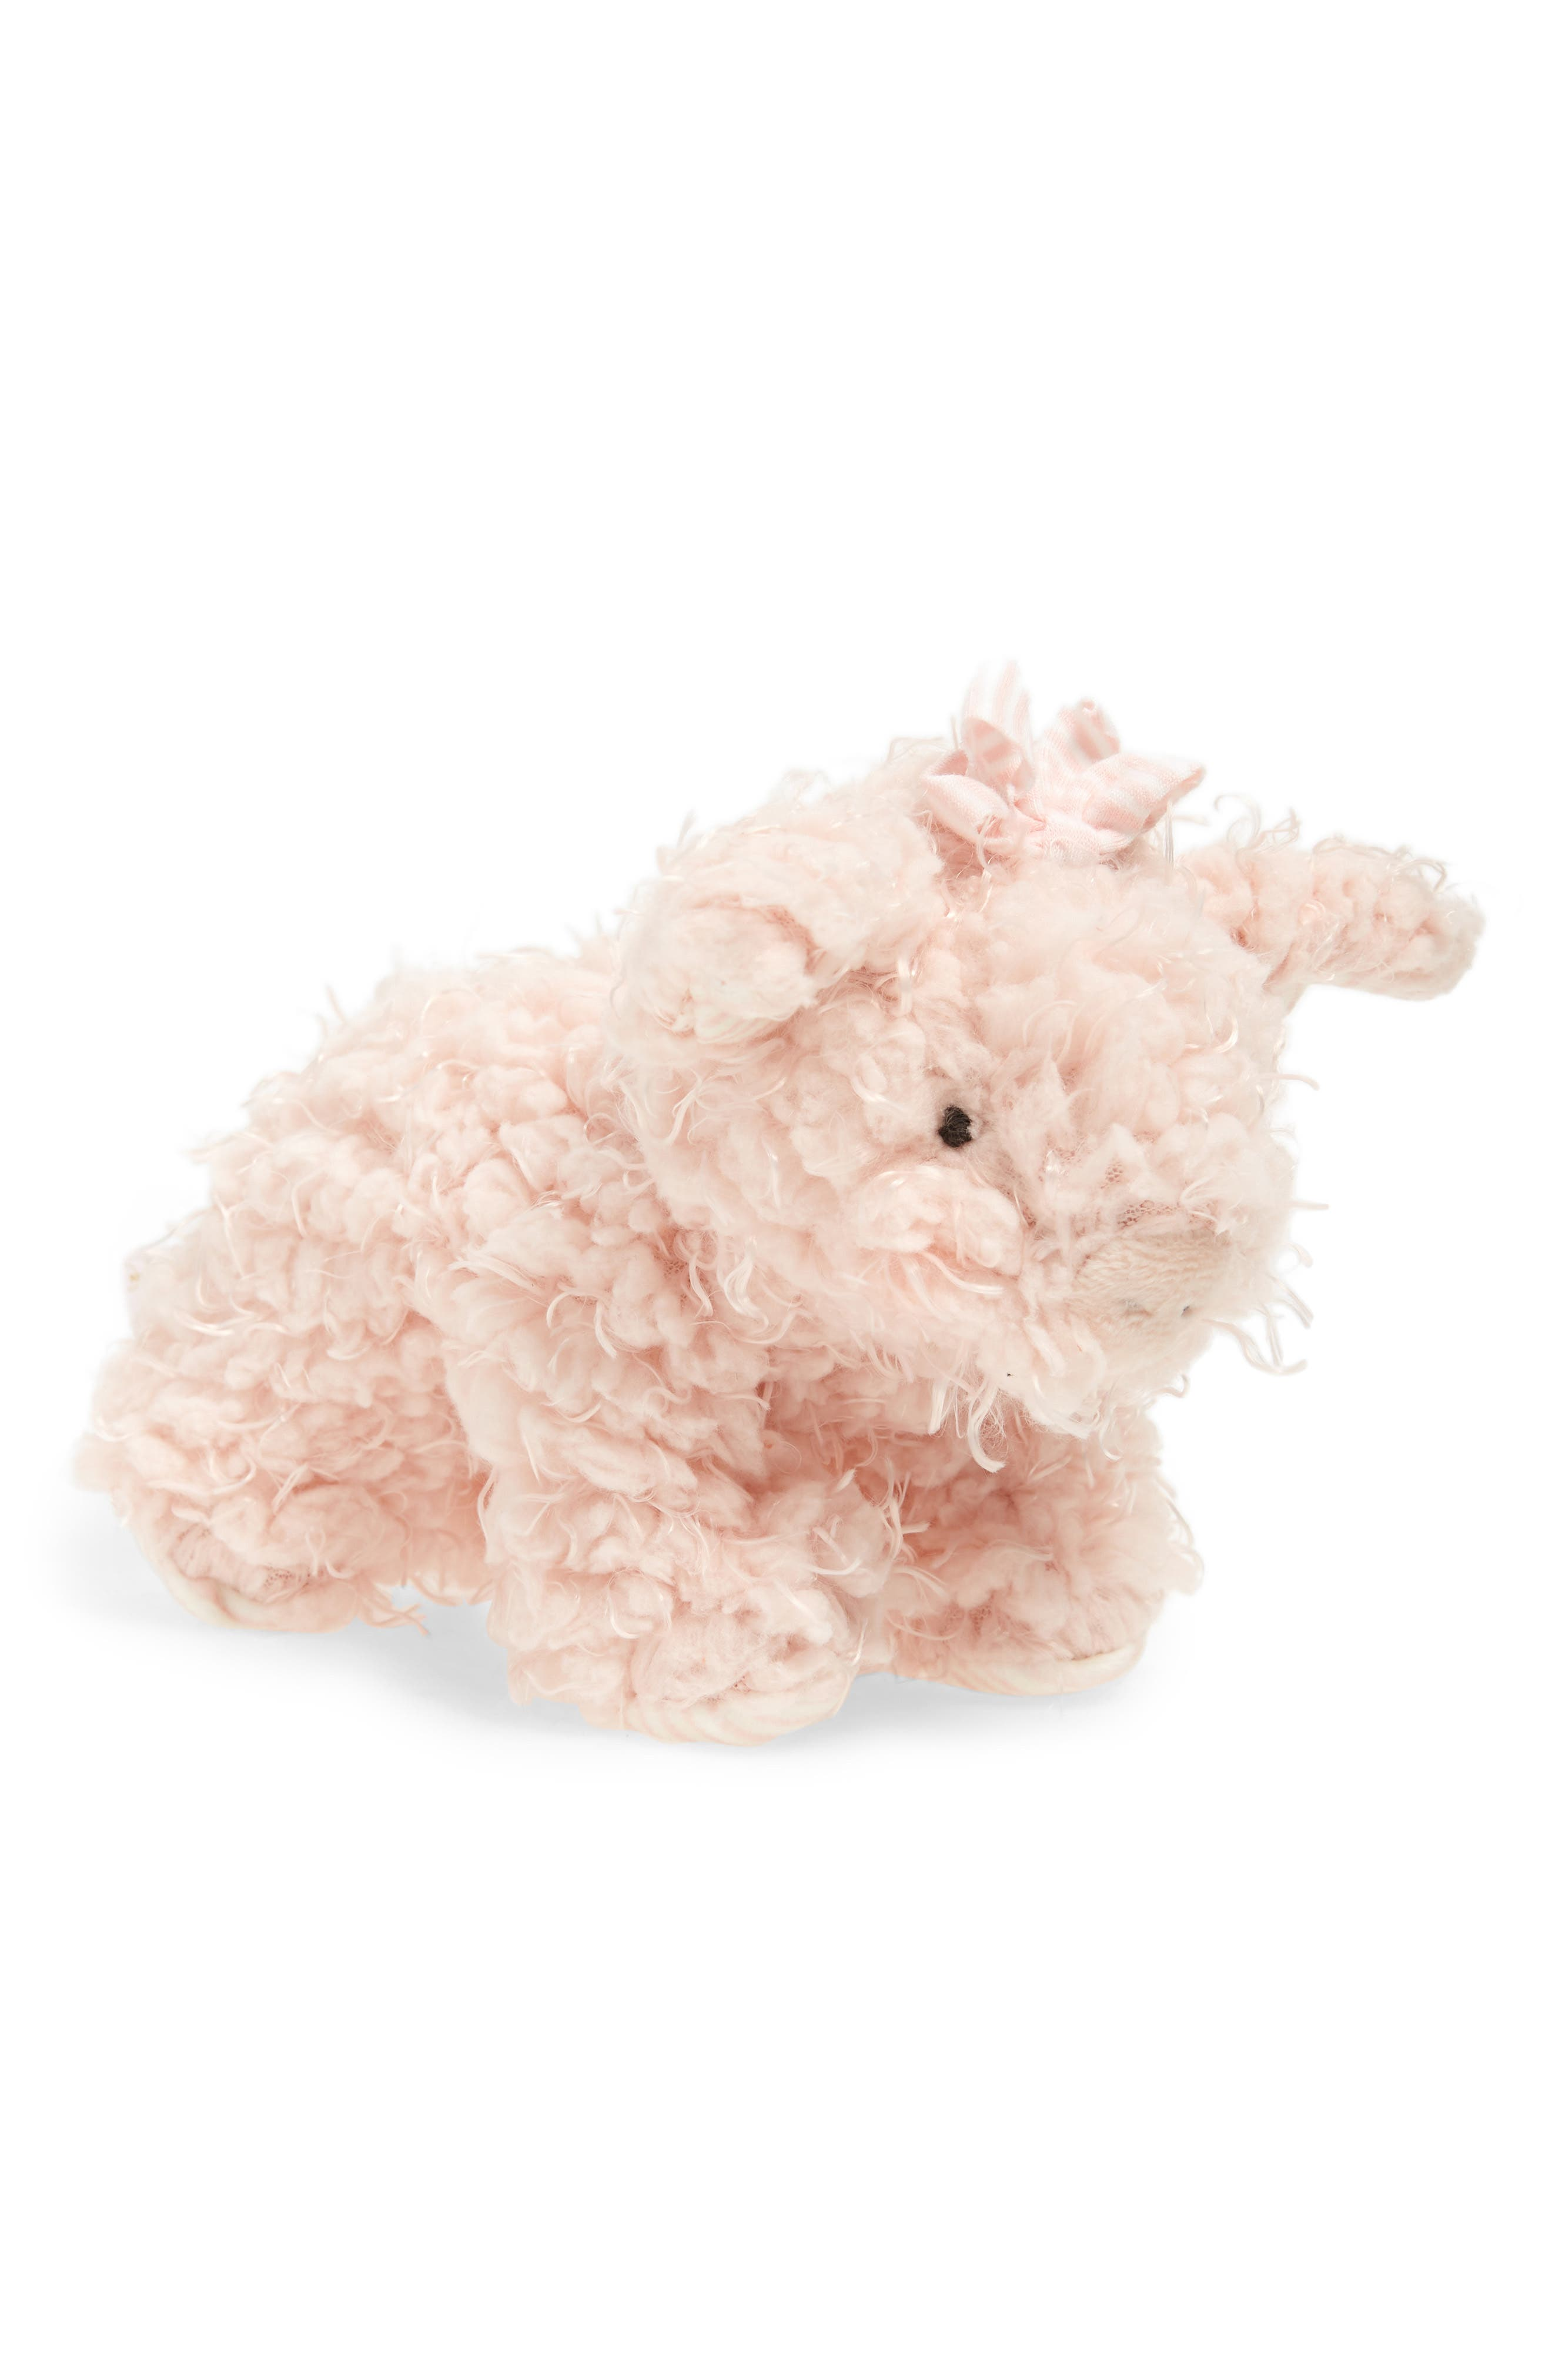 Patty Pig Stuffed Animal,                         Main,                         color, Peony Pink